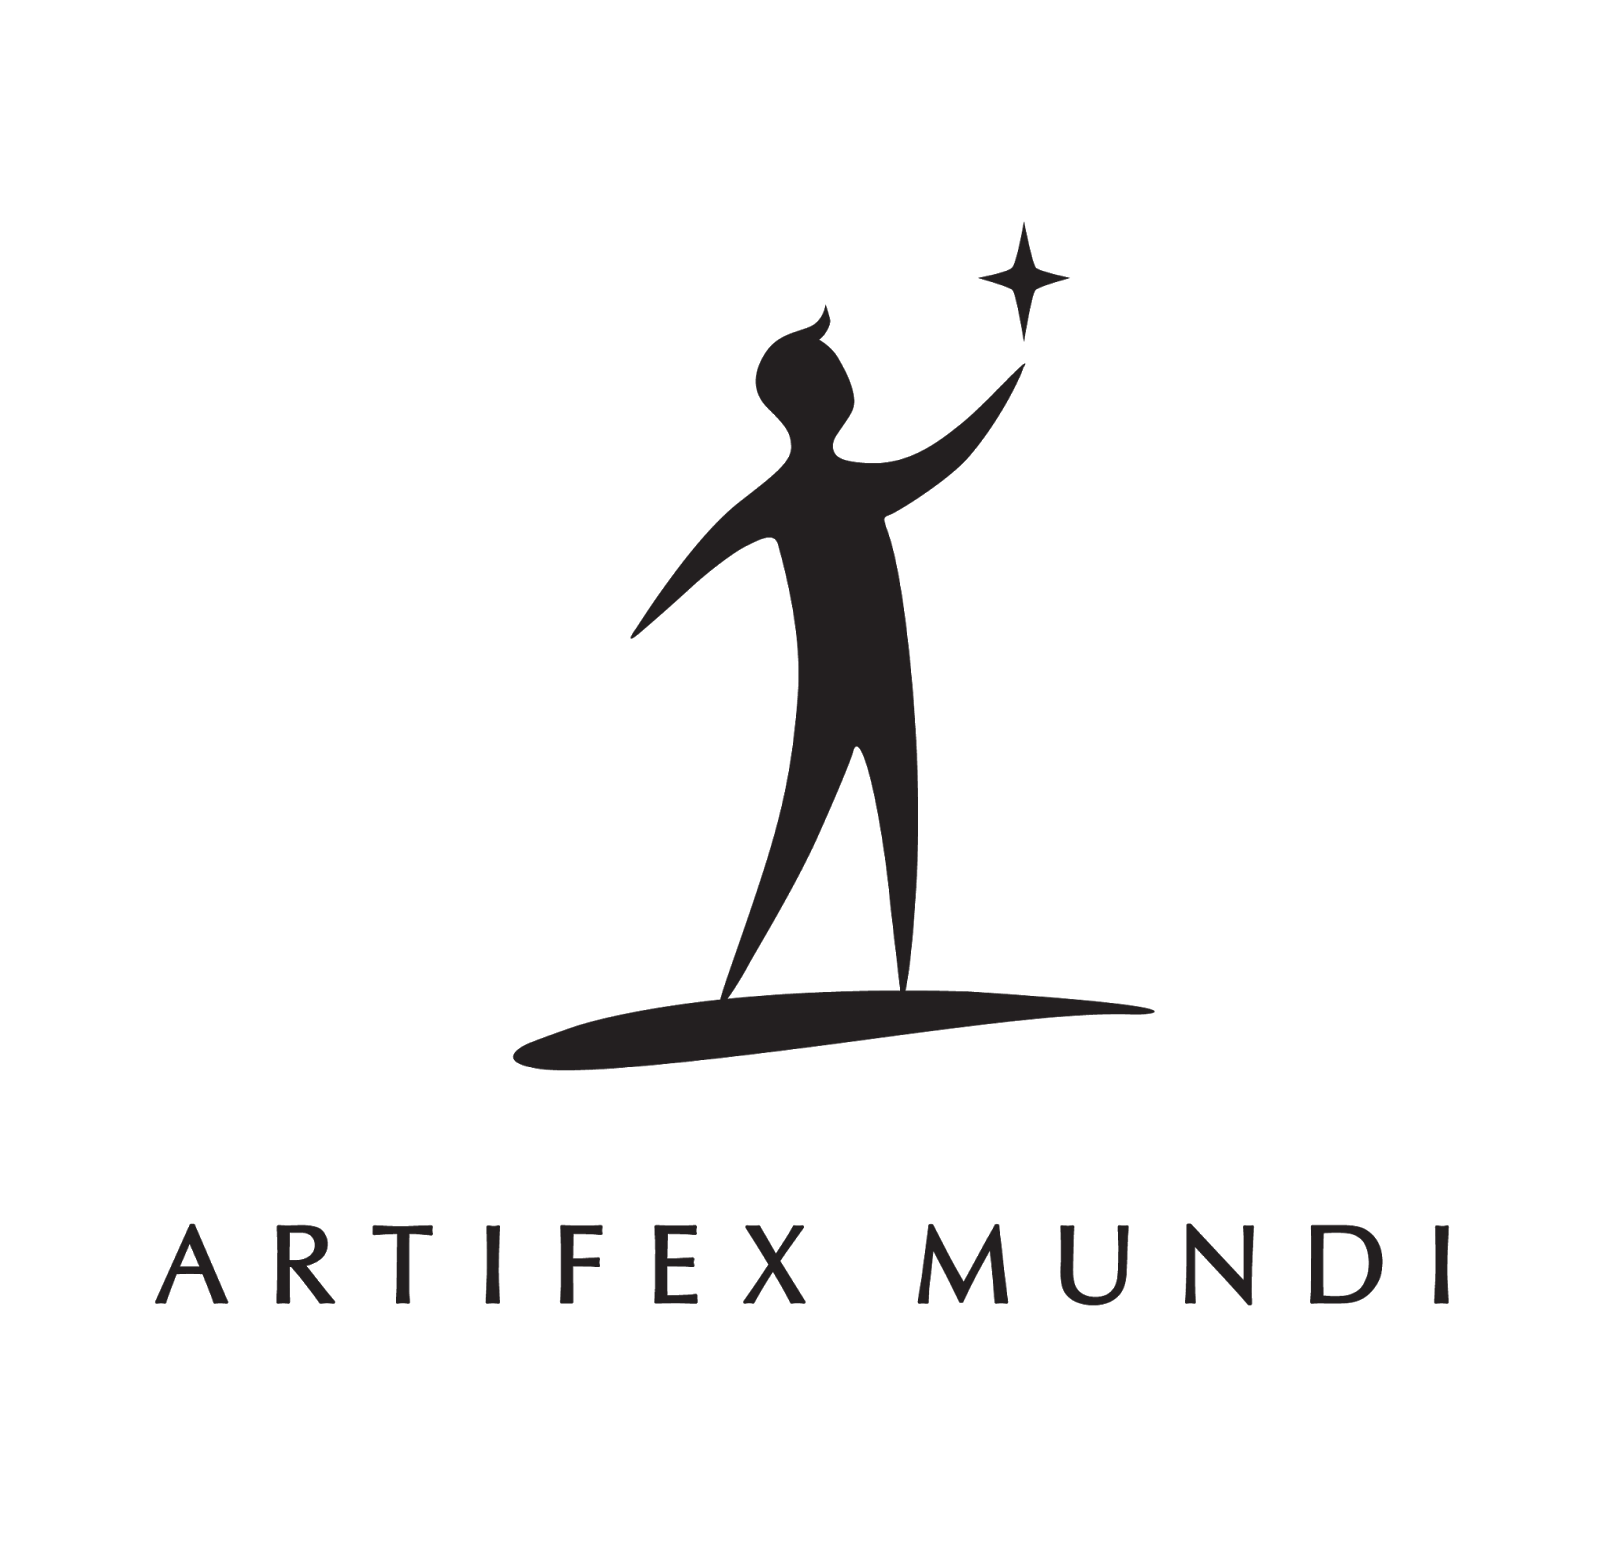 http://www.artifexmundi.com/